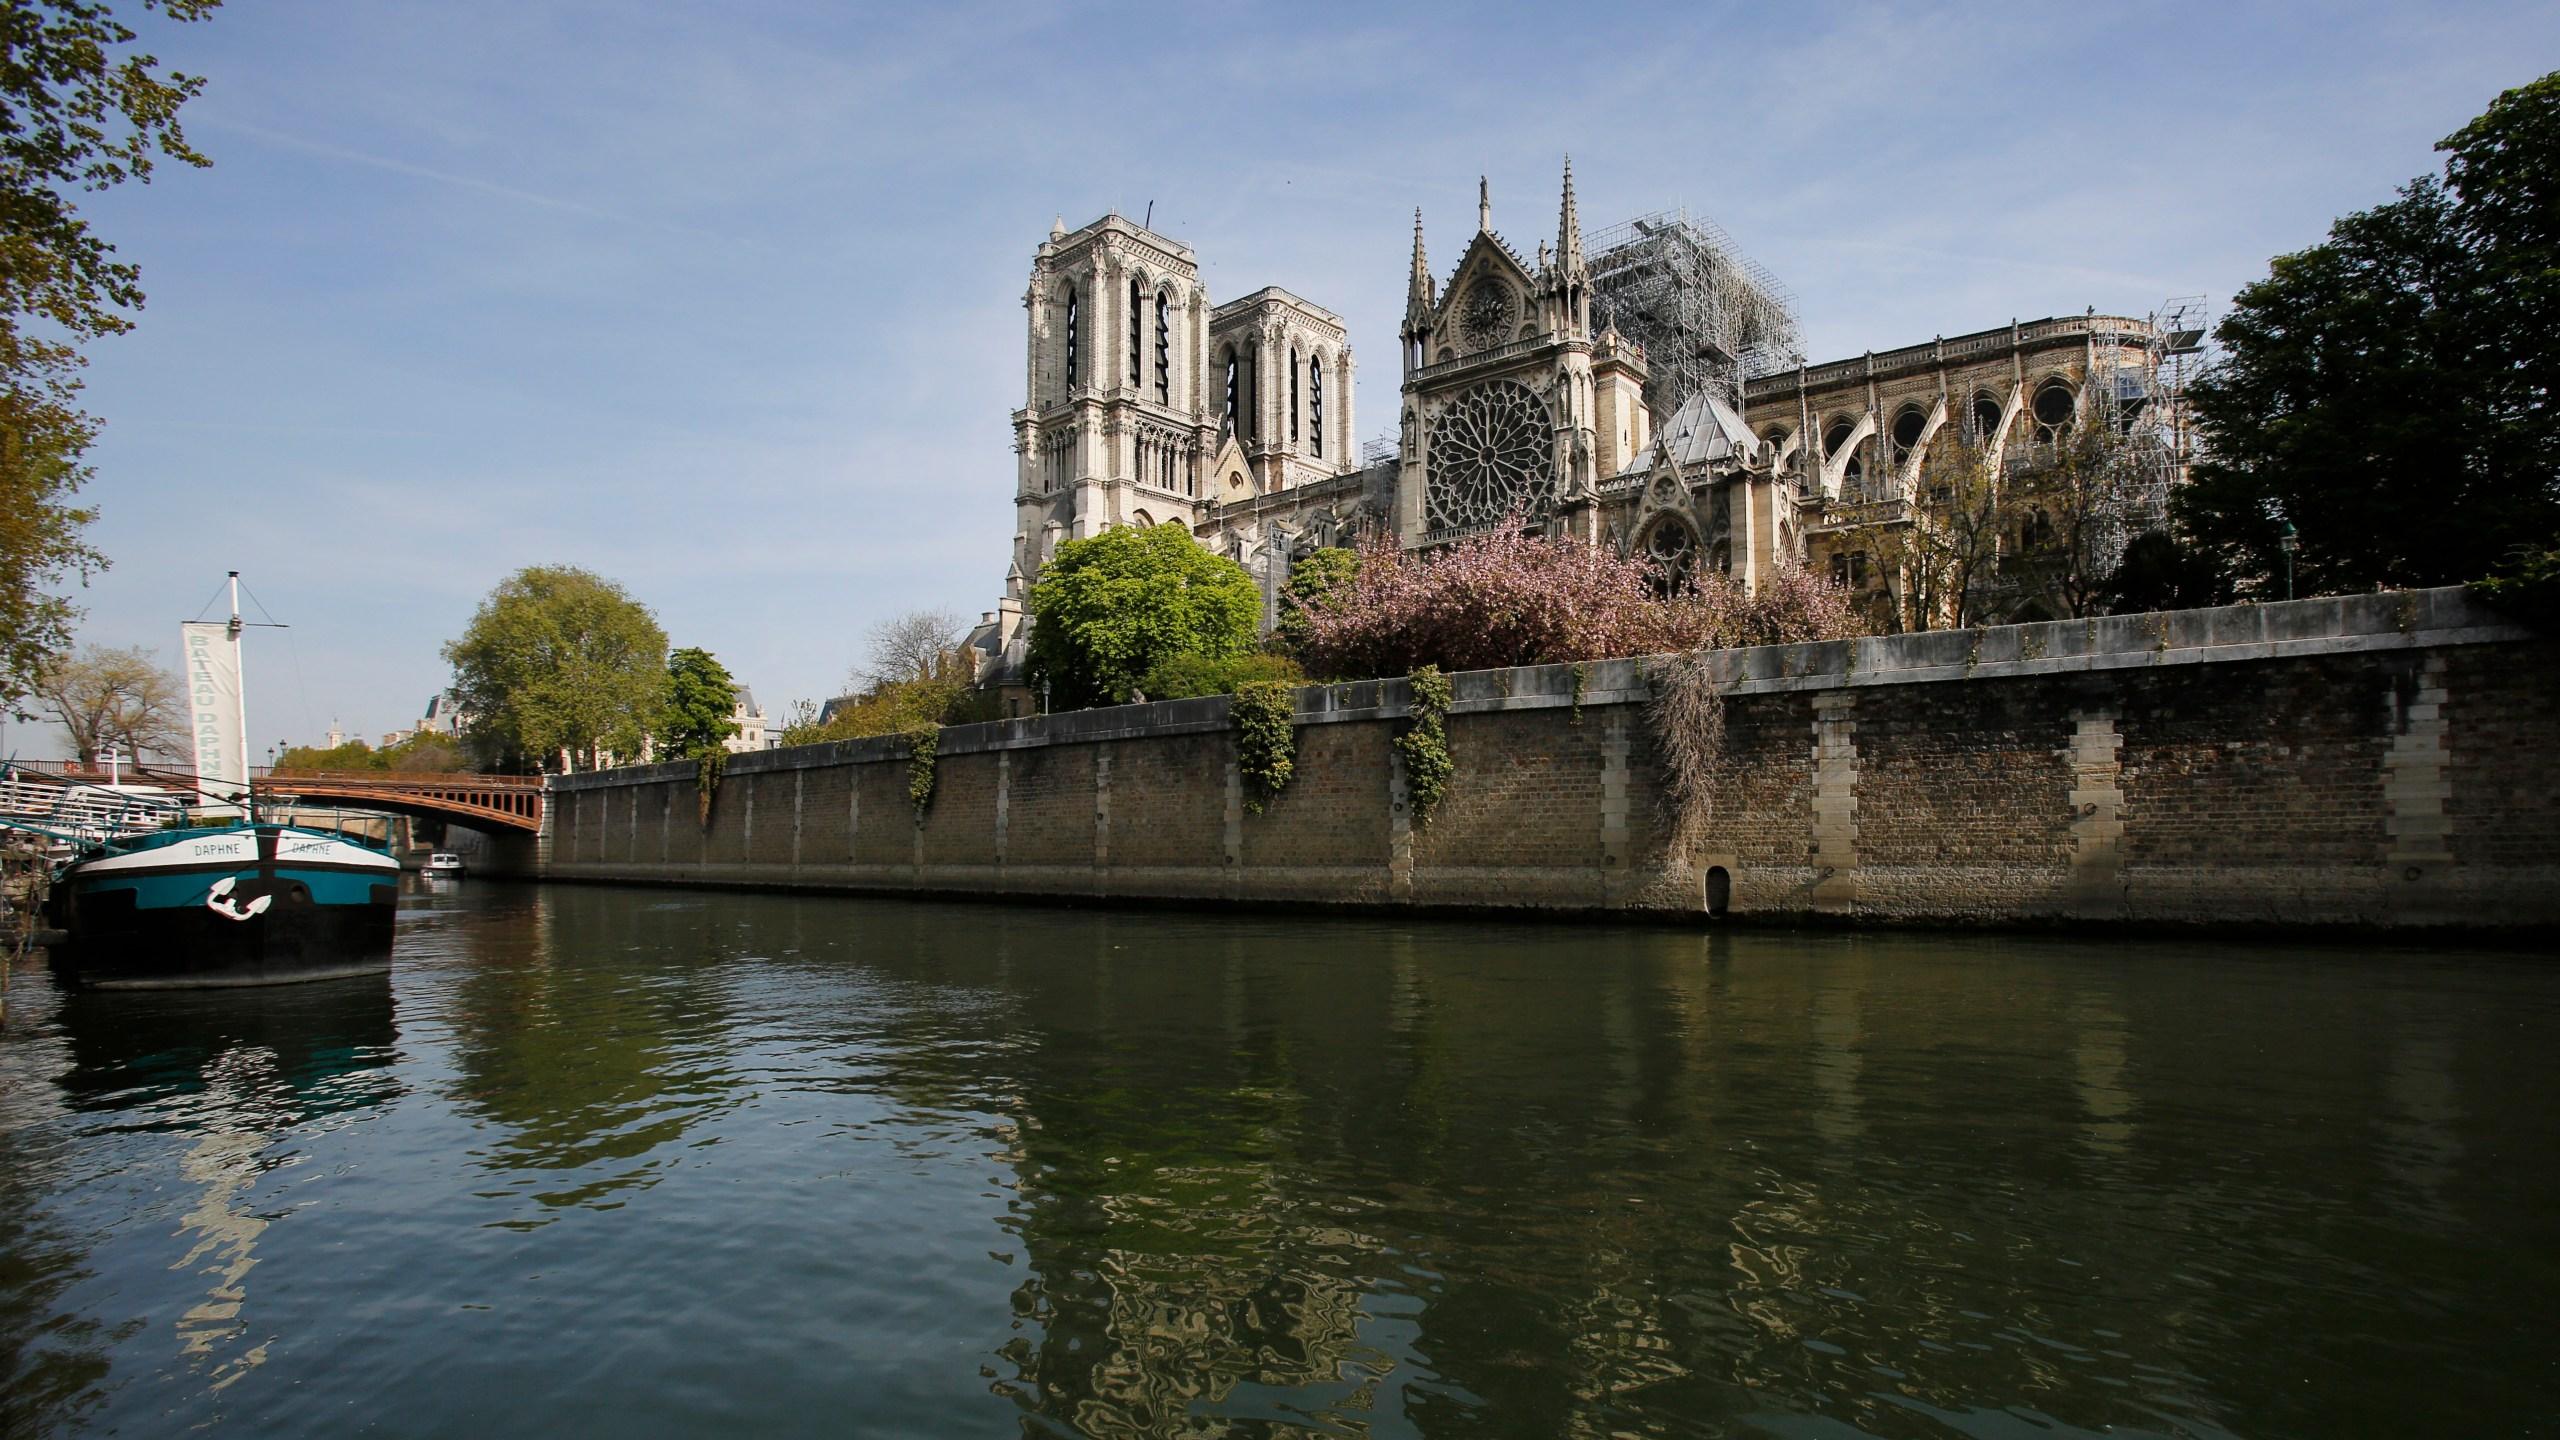 France_Notre_Dame_Fire_50251-159532.jpg50688775